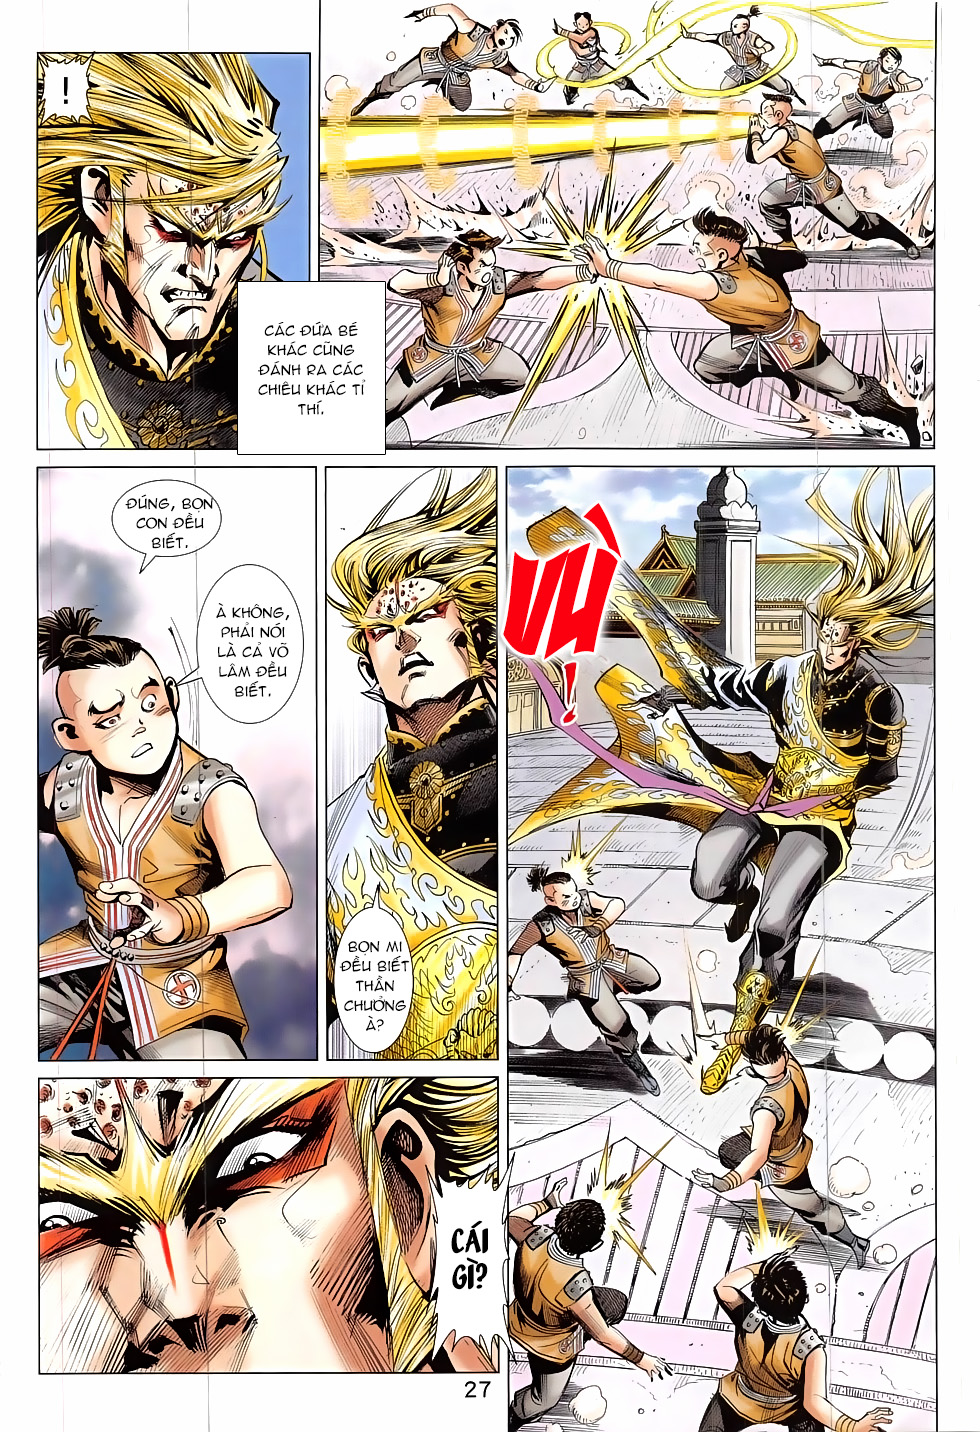 Thần Chưởng chap 24 – End Trang 27 - Mangak.info